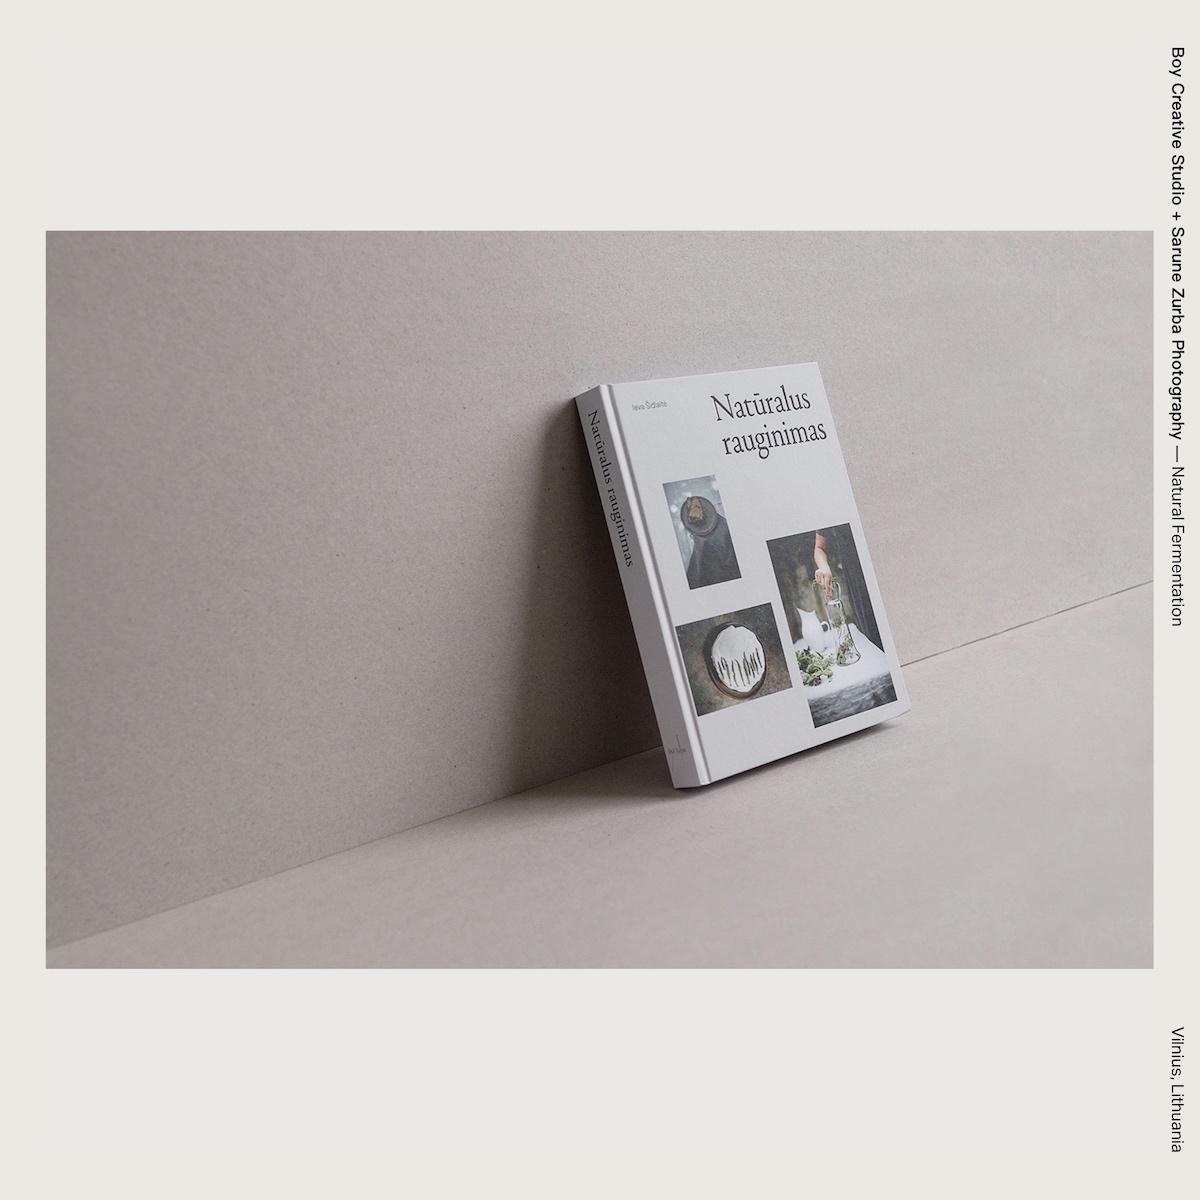 Boy Creative Studio + Sarune Zurba Photography  — Natural Fermentation